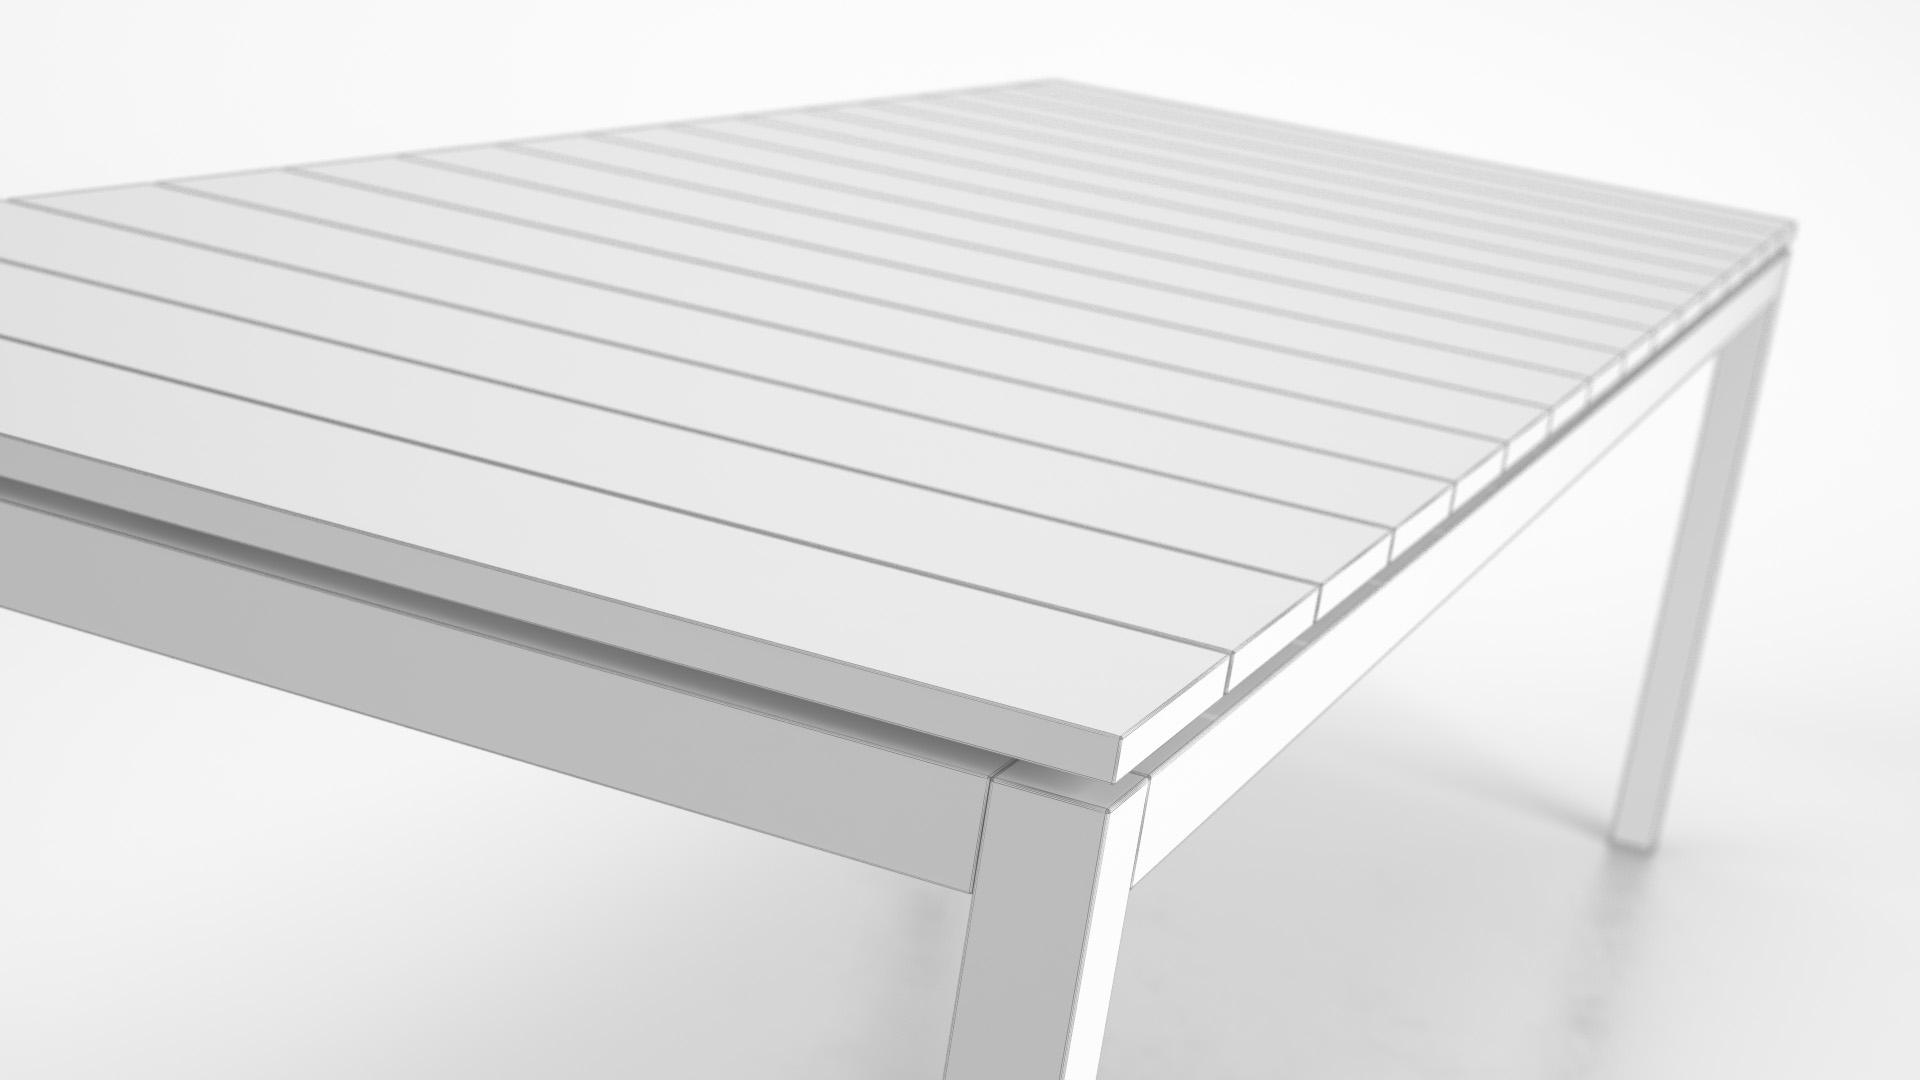 Tribu_NatalTechno_Table_WhiteSet_01_wire_0003